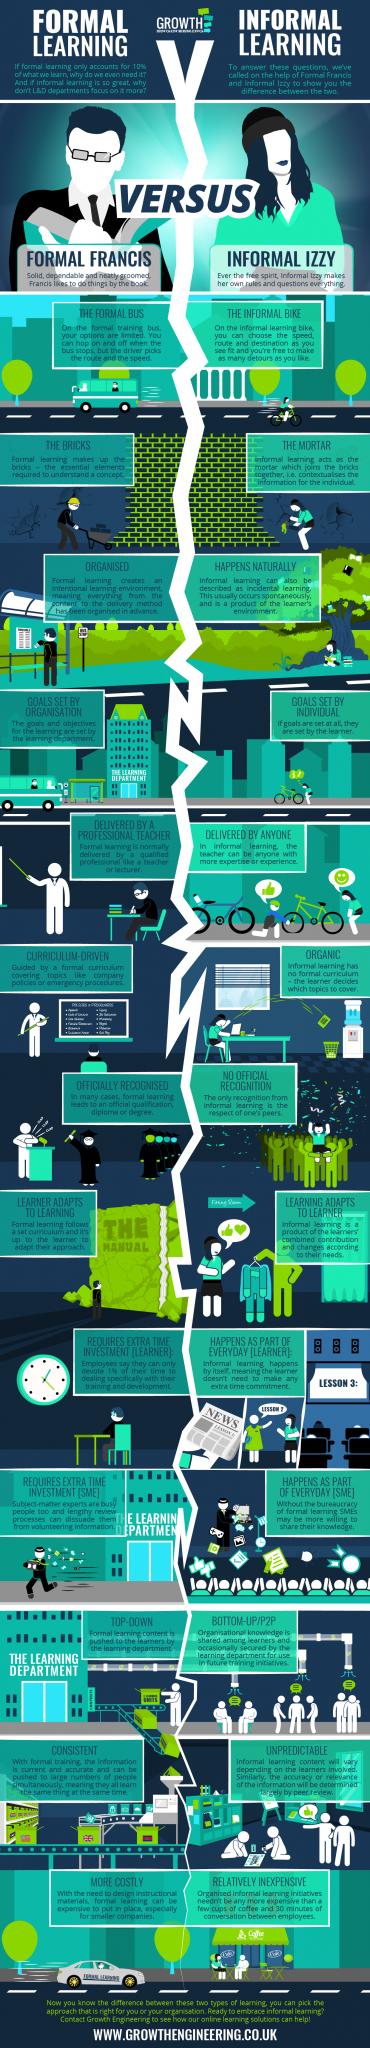 Informal Learning Vs Formal Learning Infographic